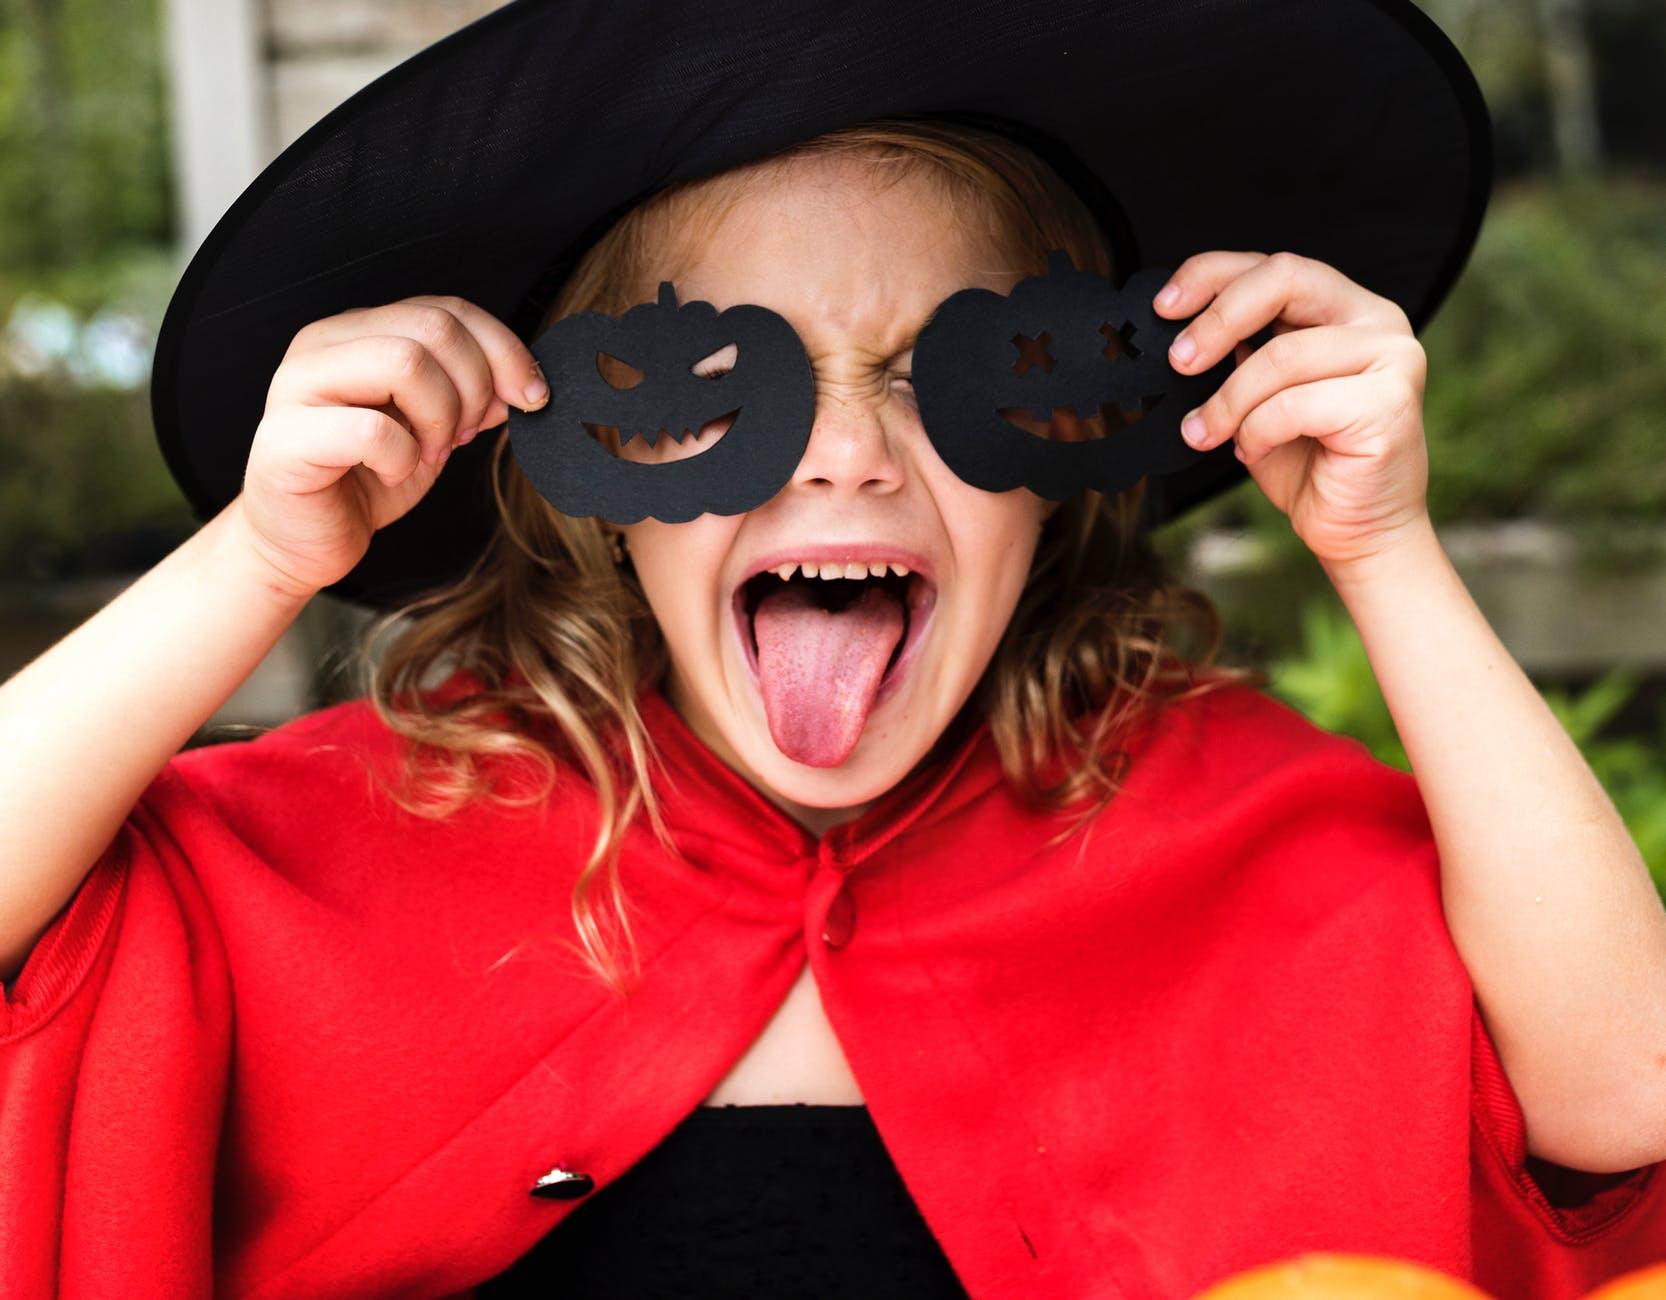 woman wearing halloween costume